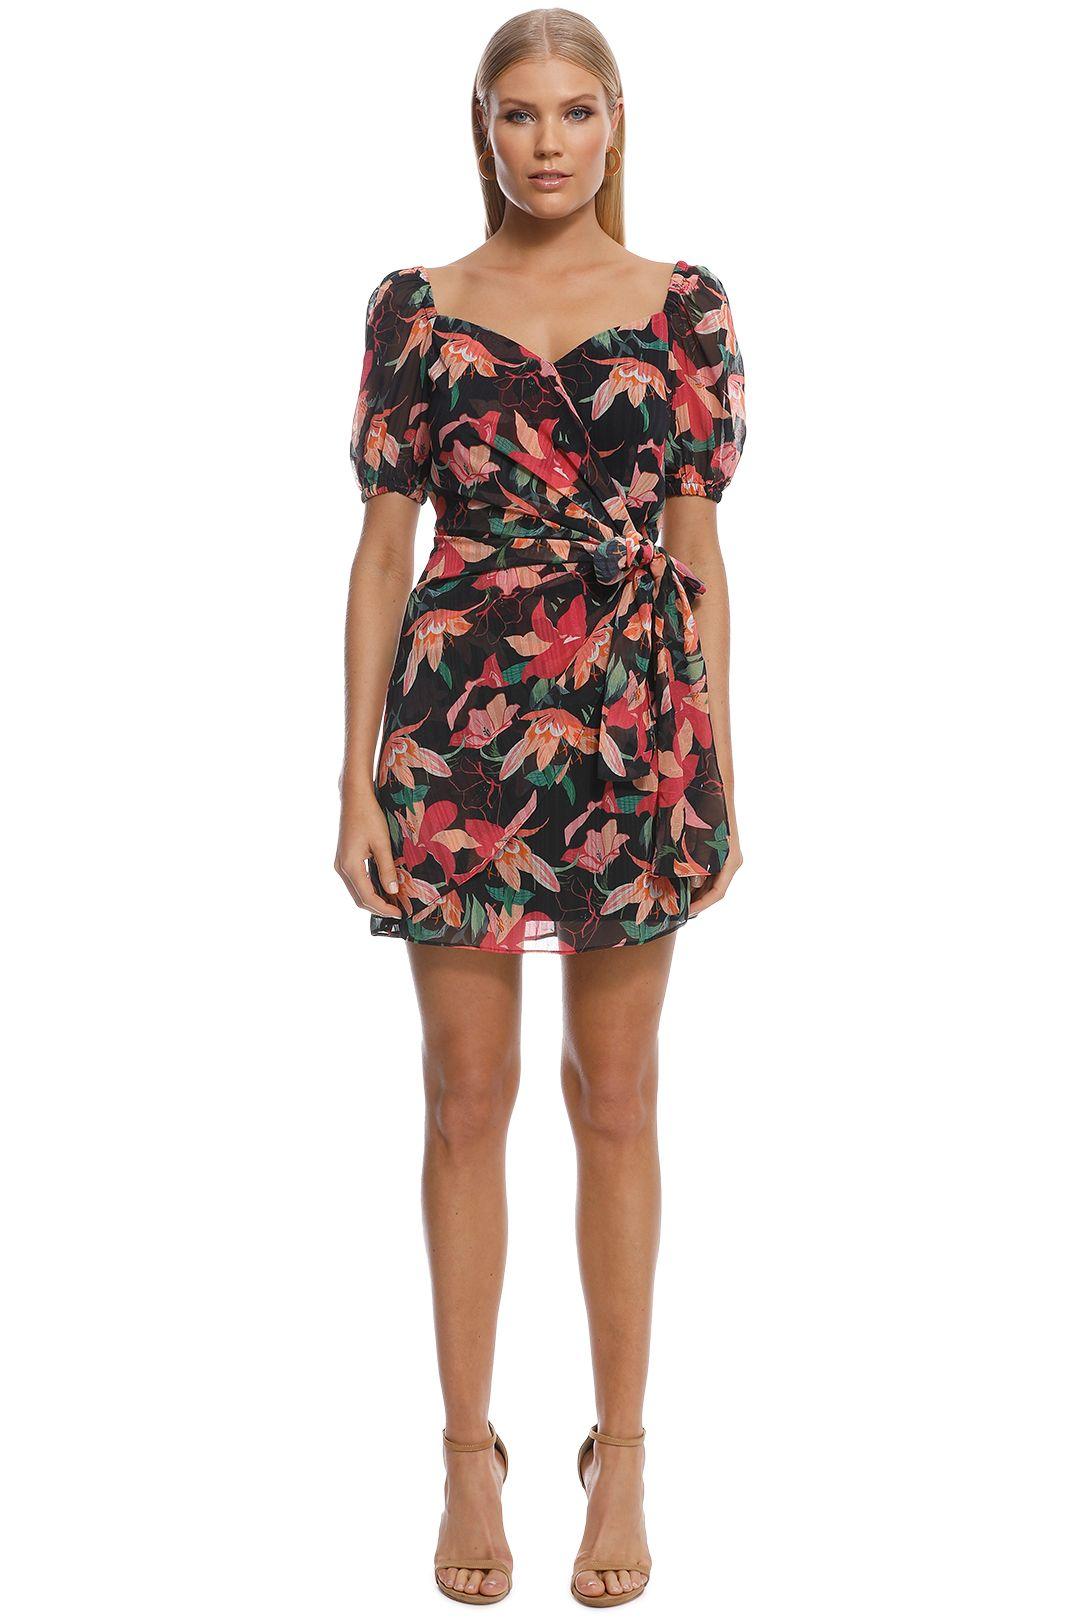 Talulah - Night Mirage Mini Dress - Black Floral - Front